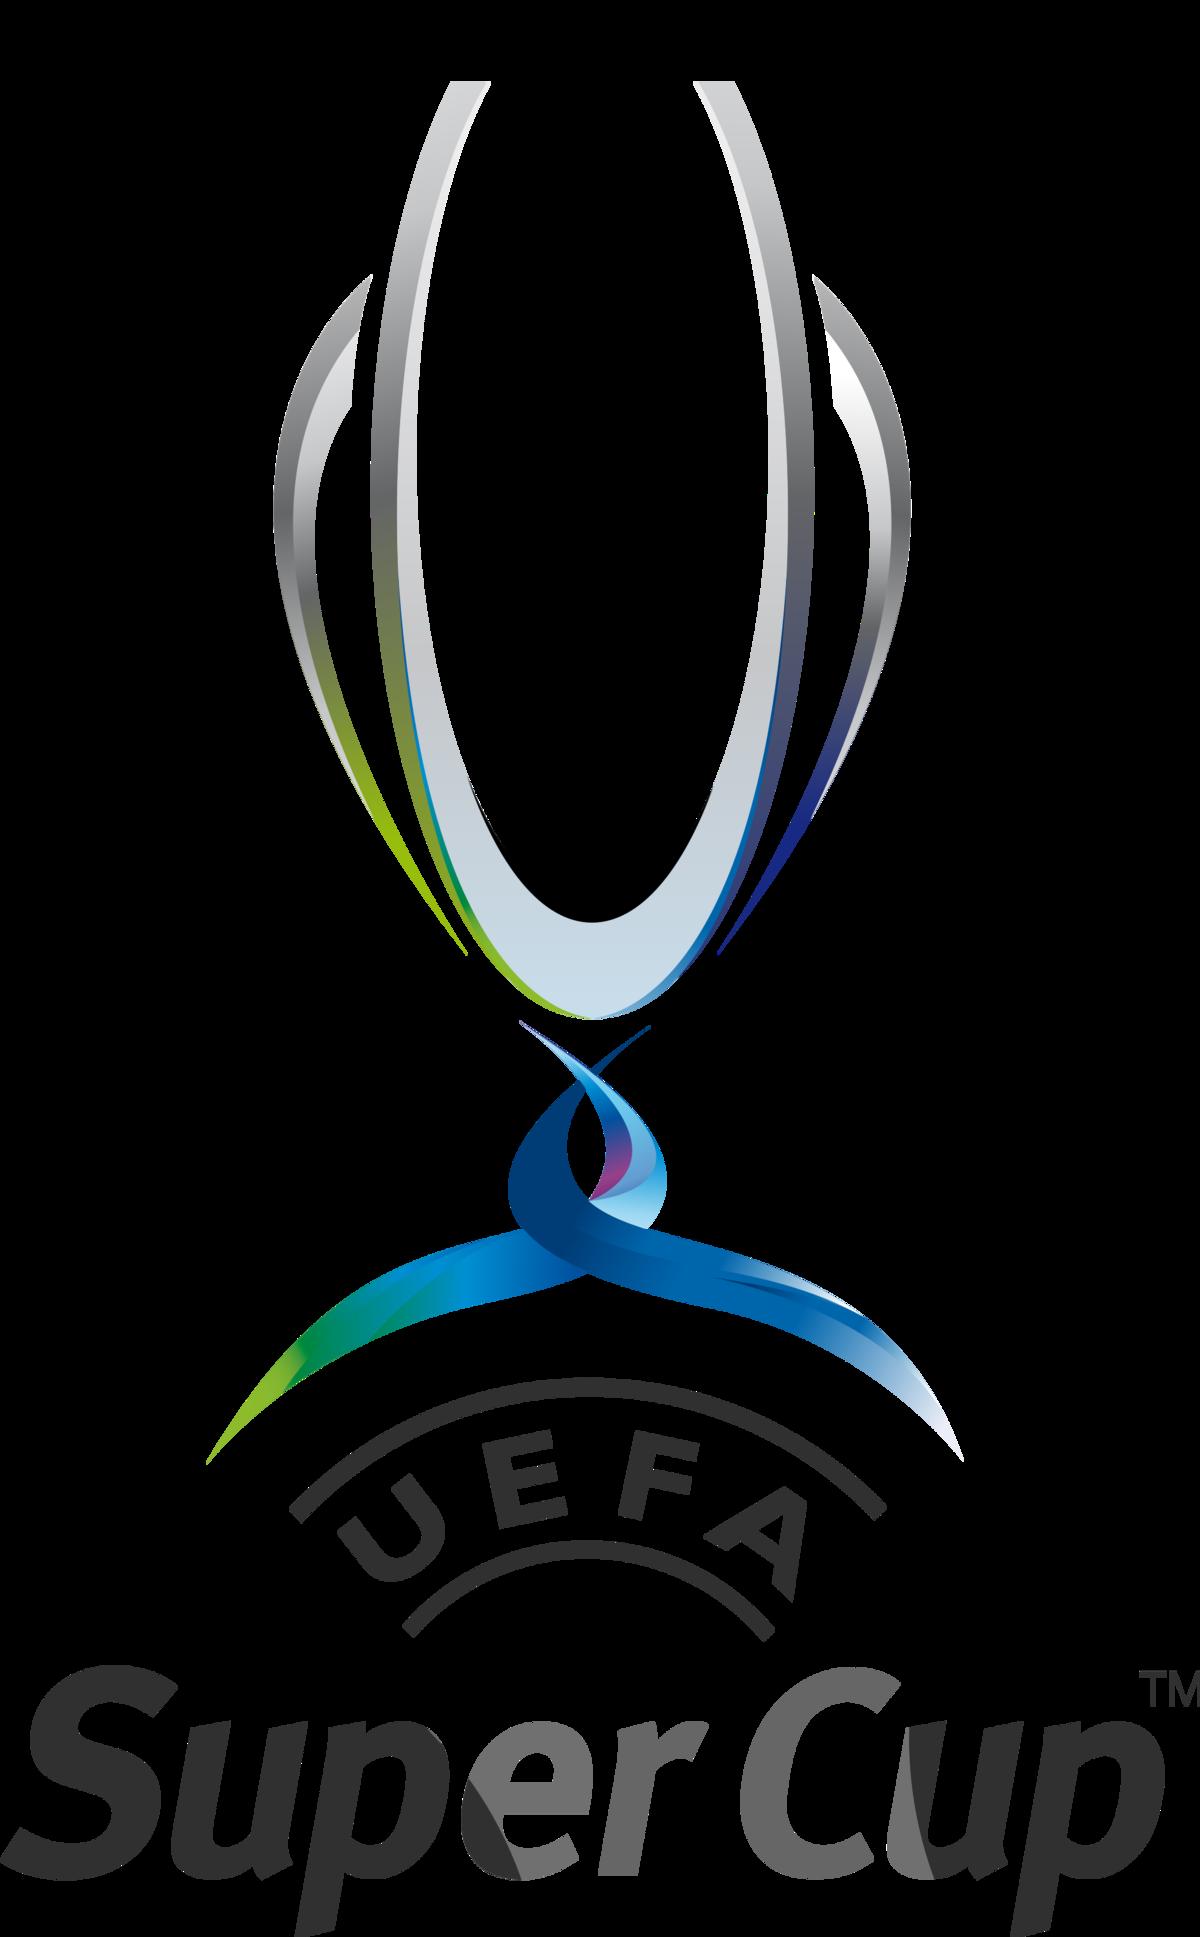 supercoppa uefa 2013 wikipedia